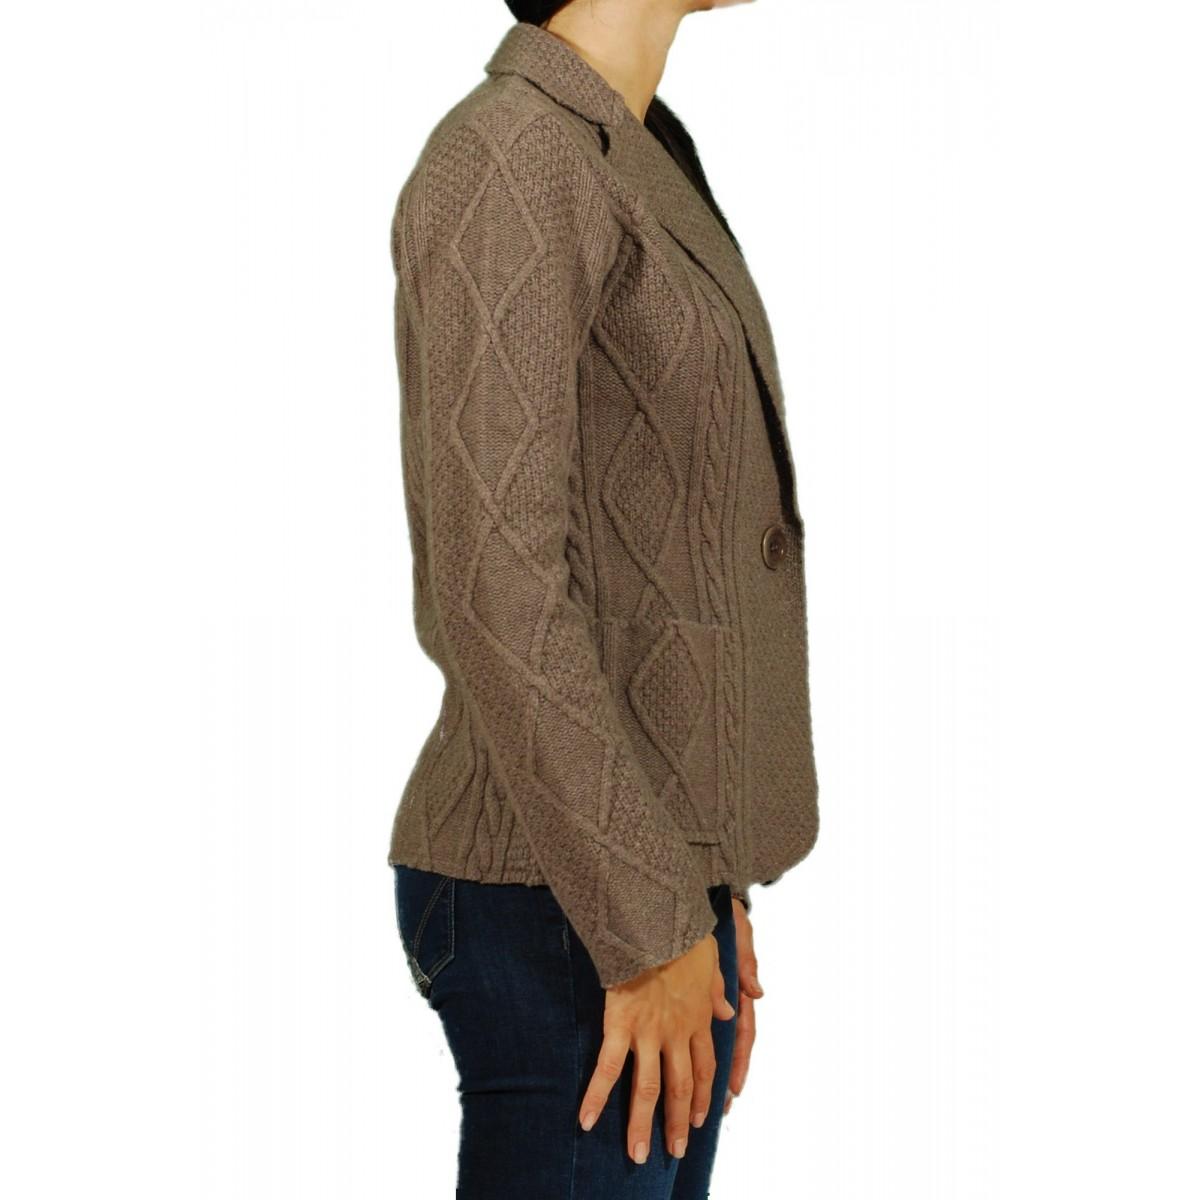 Jacket Woman Kangra - 5708/57 44 Jacket Jacket Woman Lana